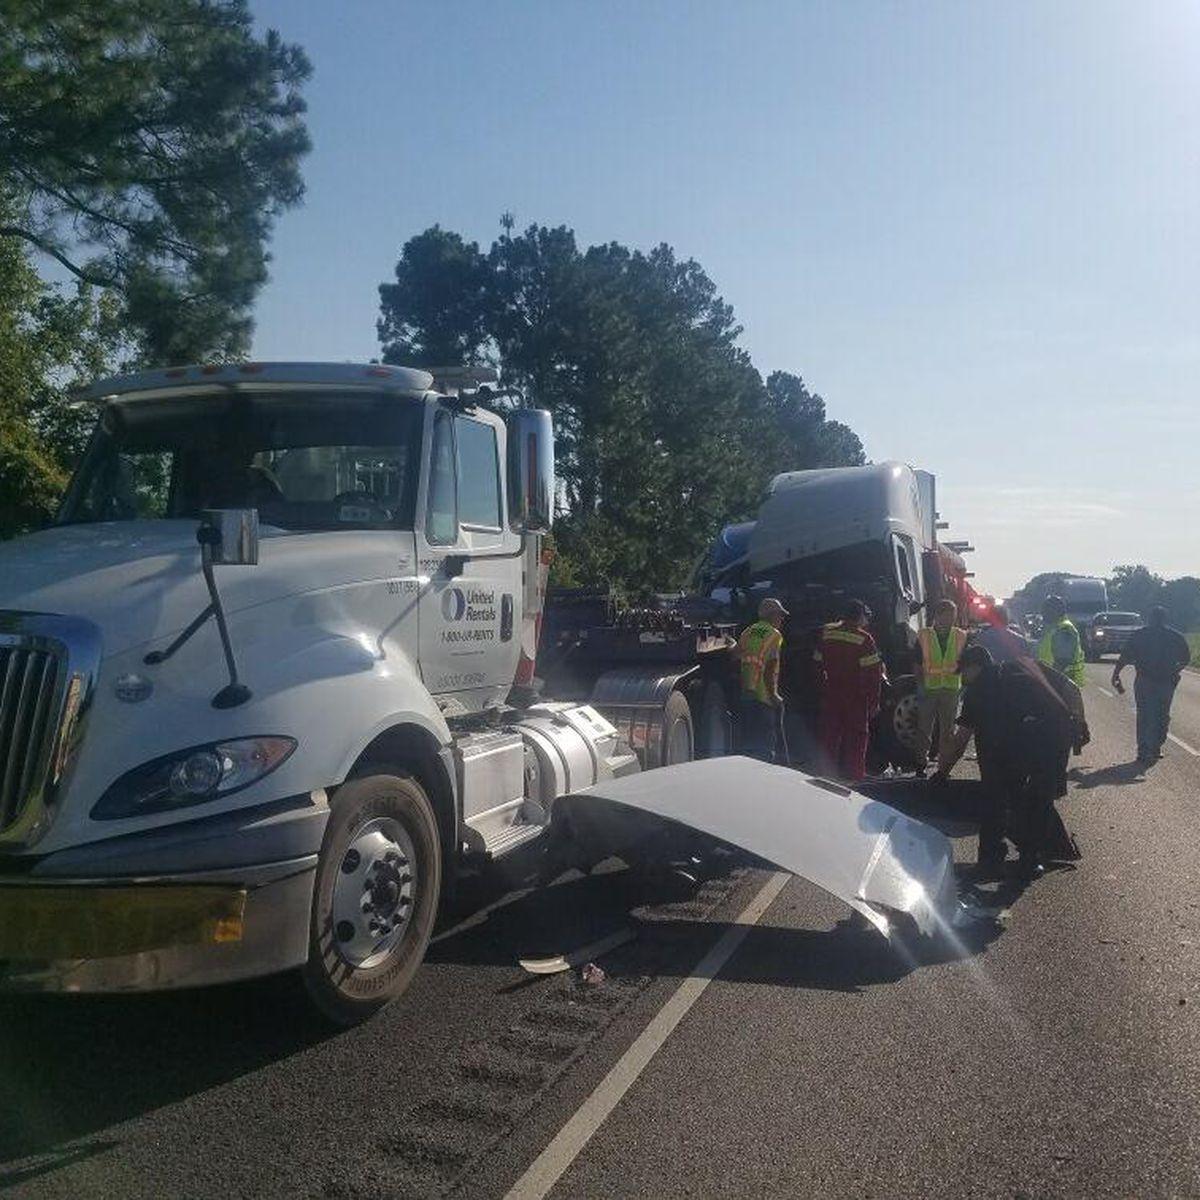 Texas man killed in wreck near Grosse Tete involving four 18-wheelers